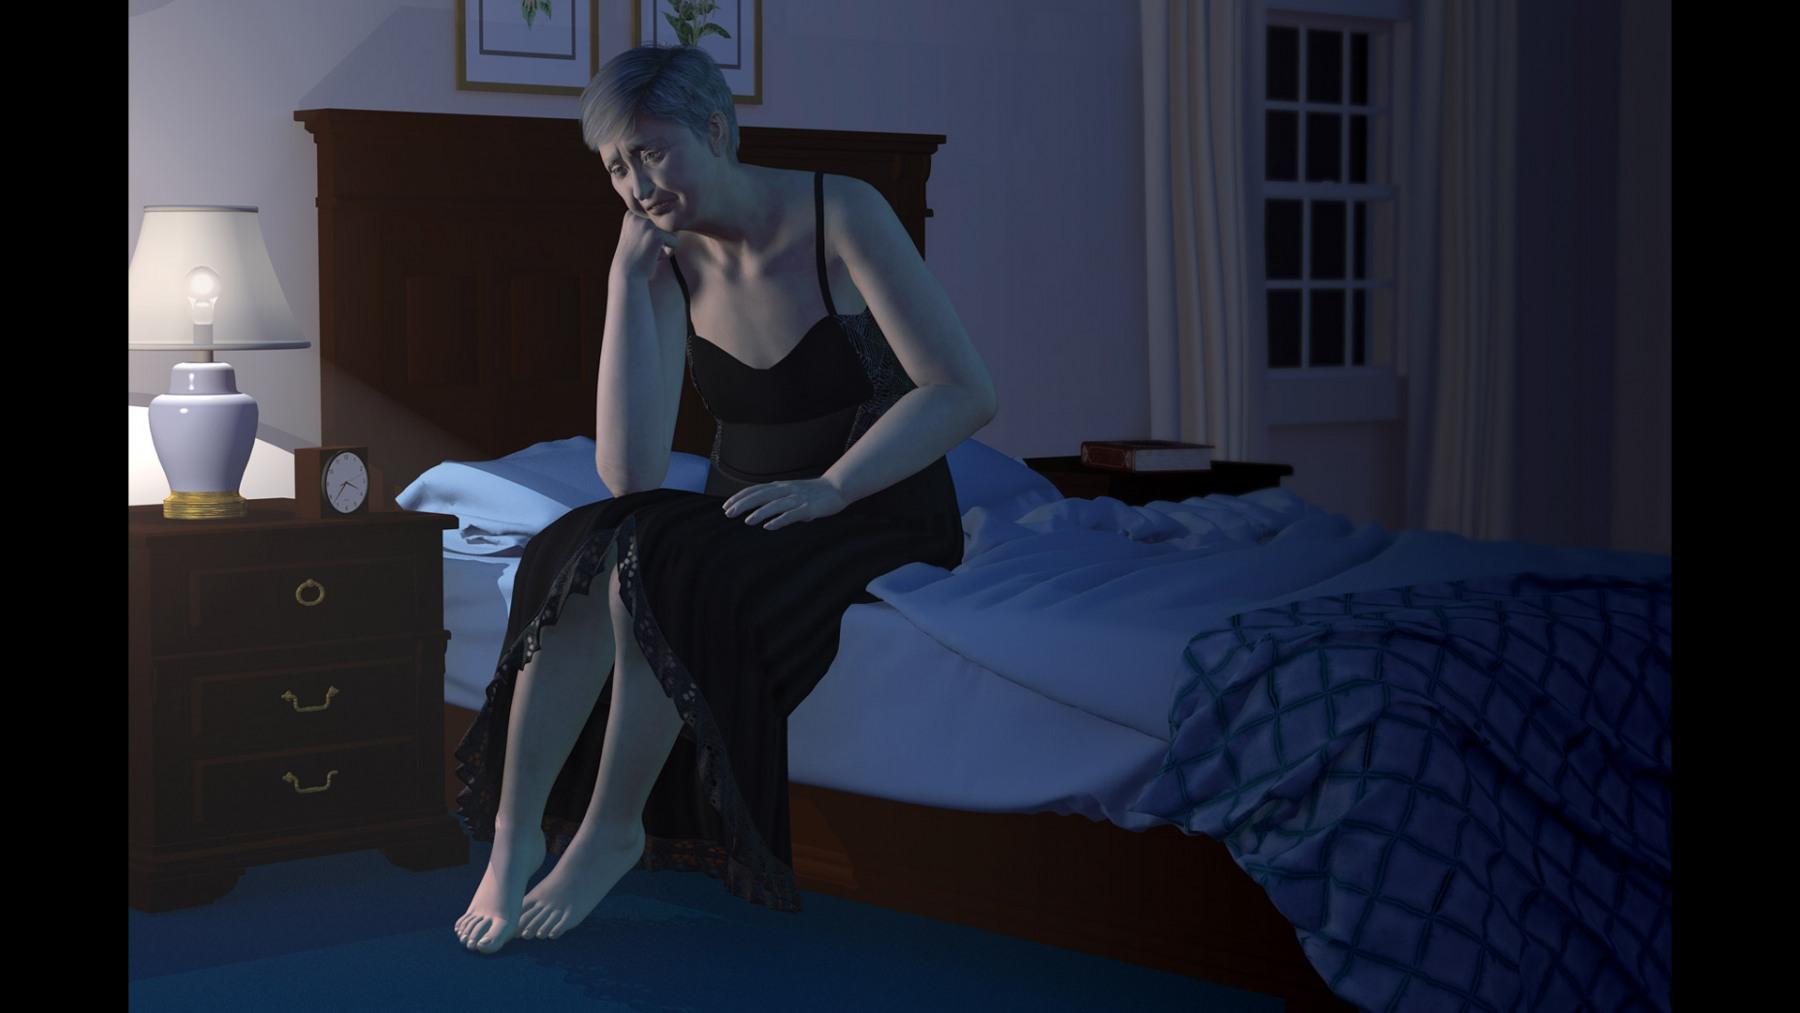 SLEEPLESS NIGHT